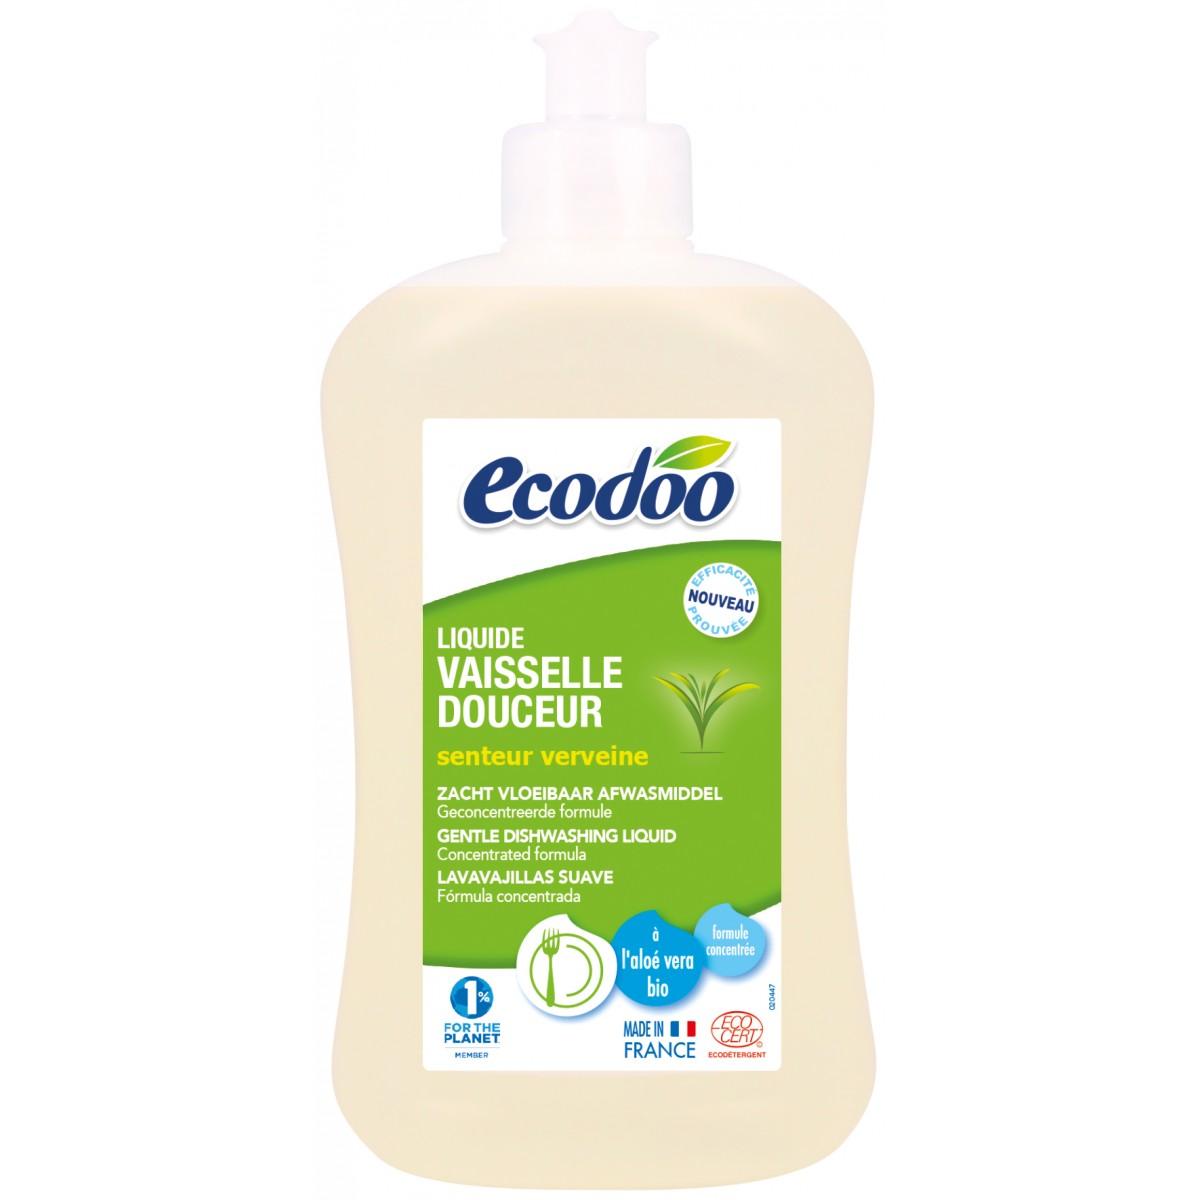 liquide vaisselle douceur cologique bio 500 ml 500 ml ecodoo. Black Bedroom Furniture Sets. Home Design Ideas